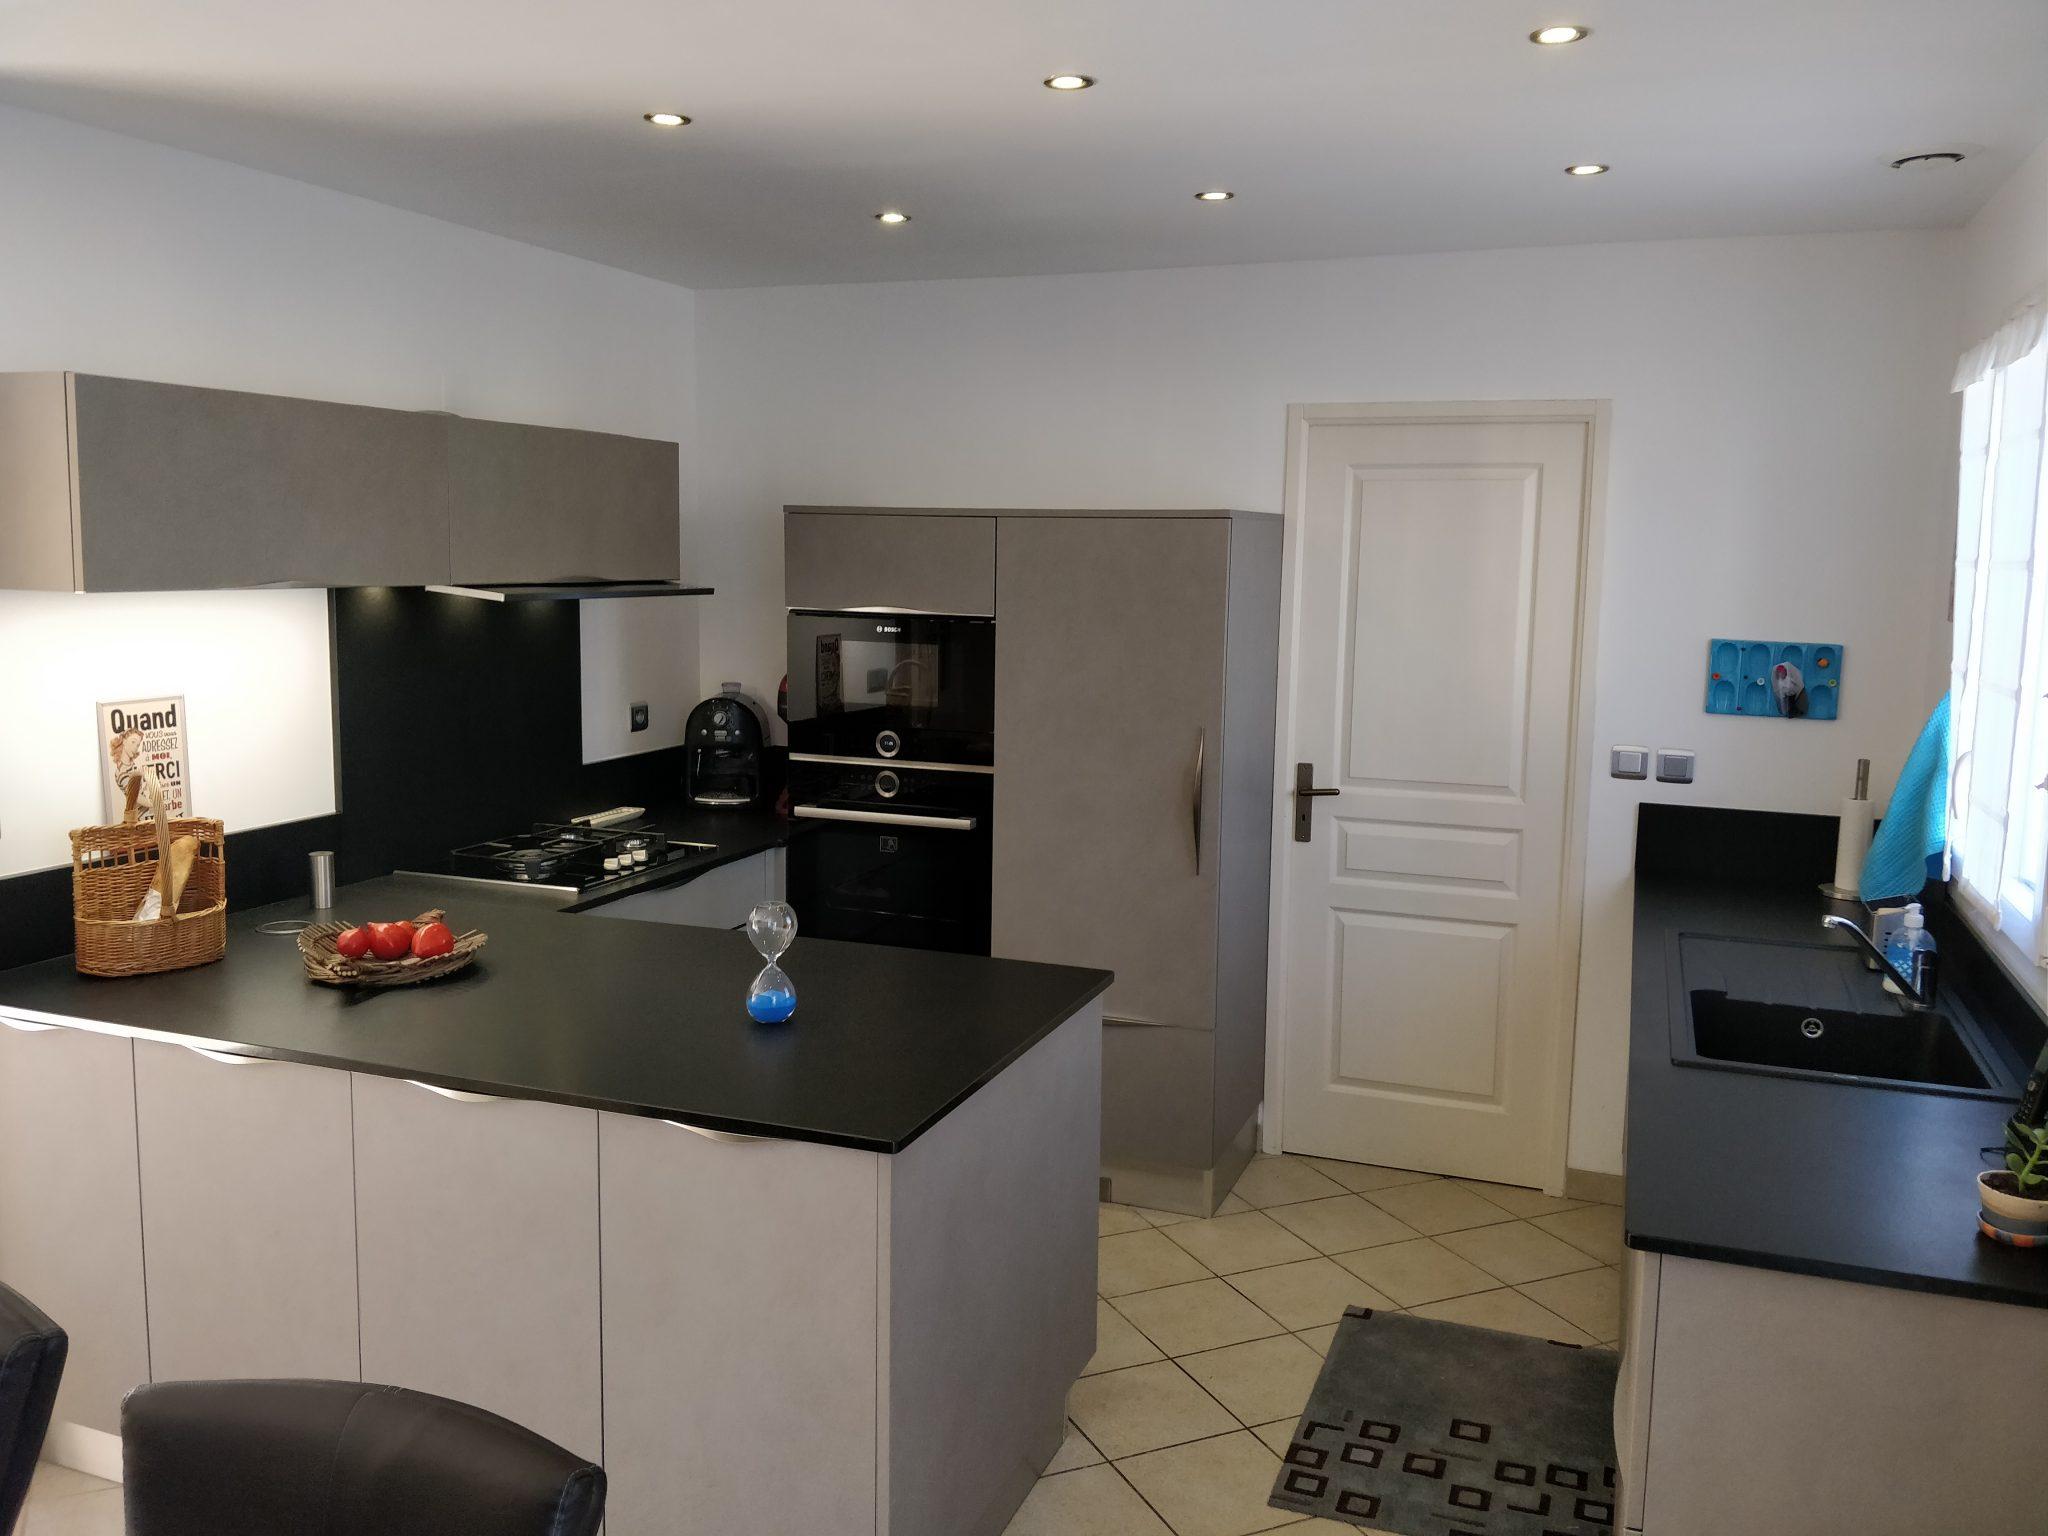 nos r alisations bienvenue chez marco mj veneta cucine france. Black Bedroom Furniture Sets. Home Design Ideas